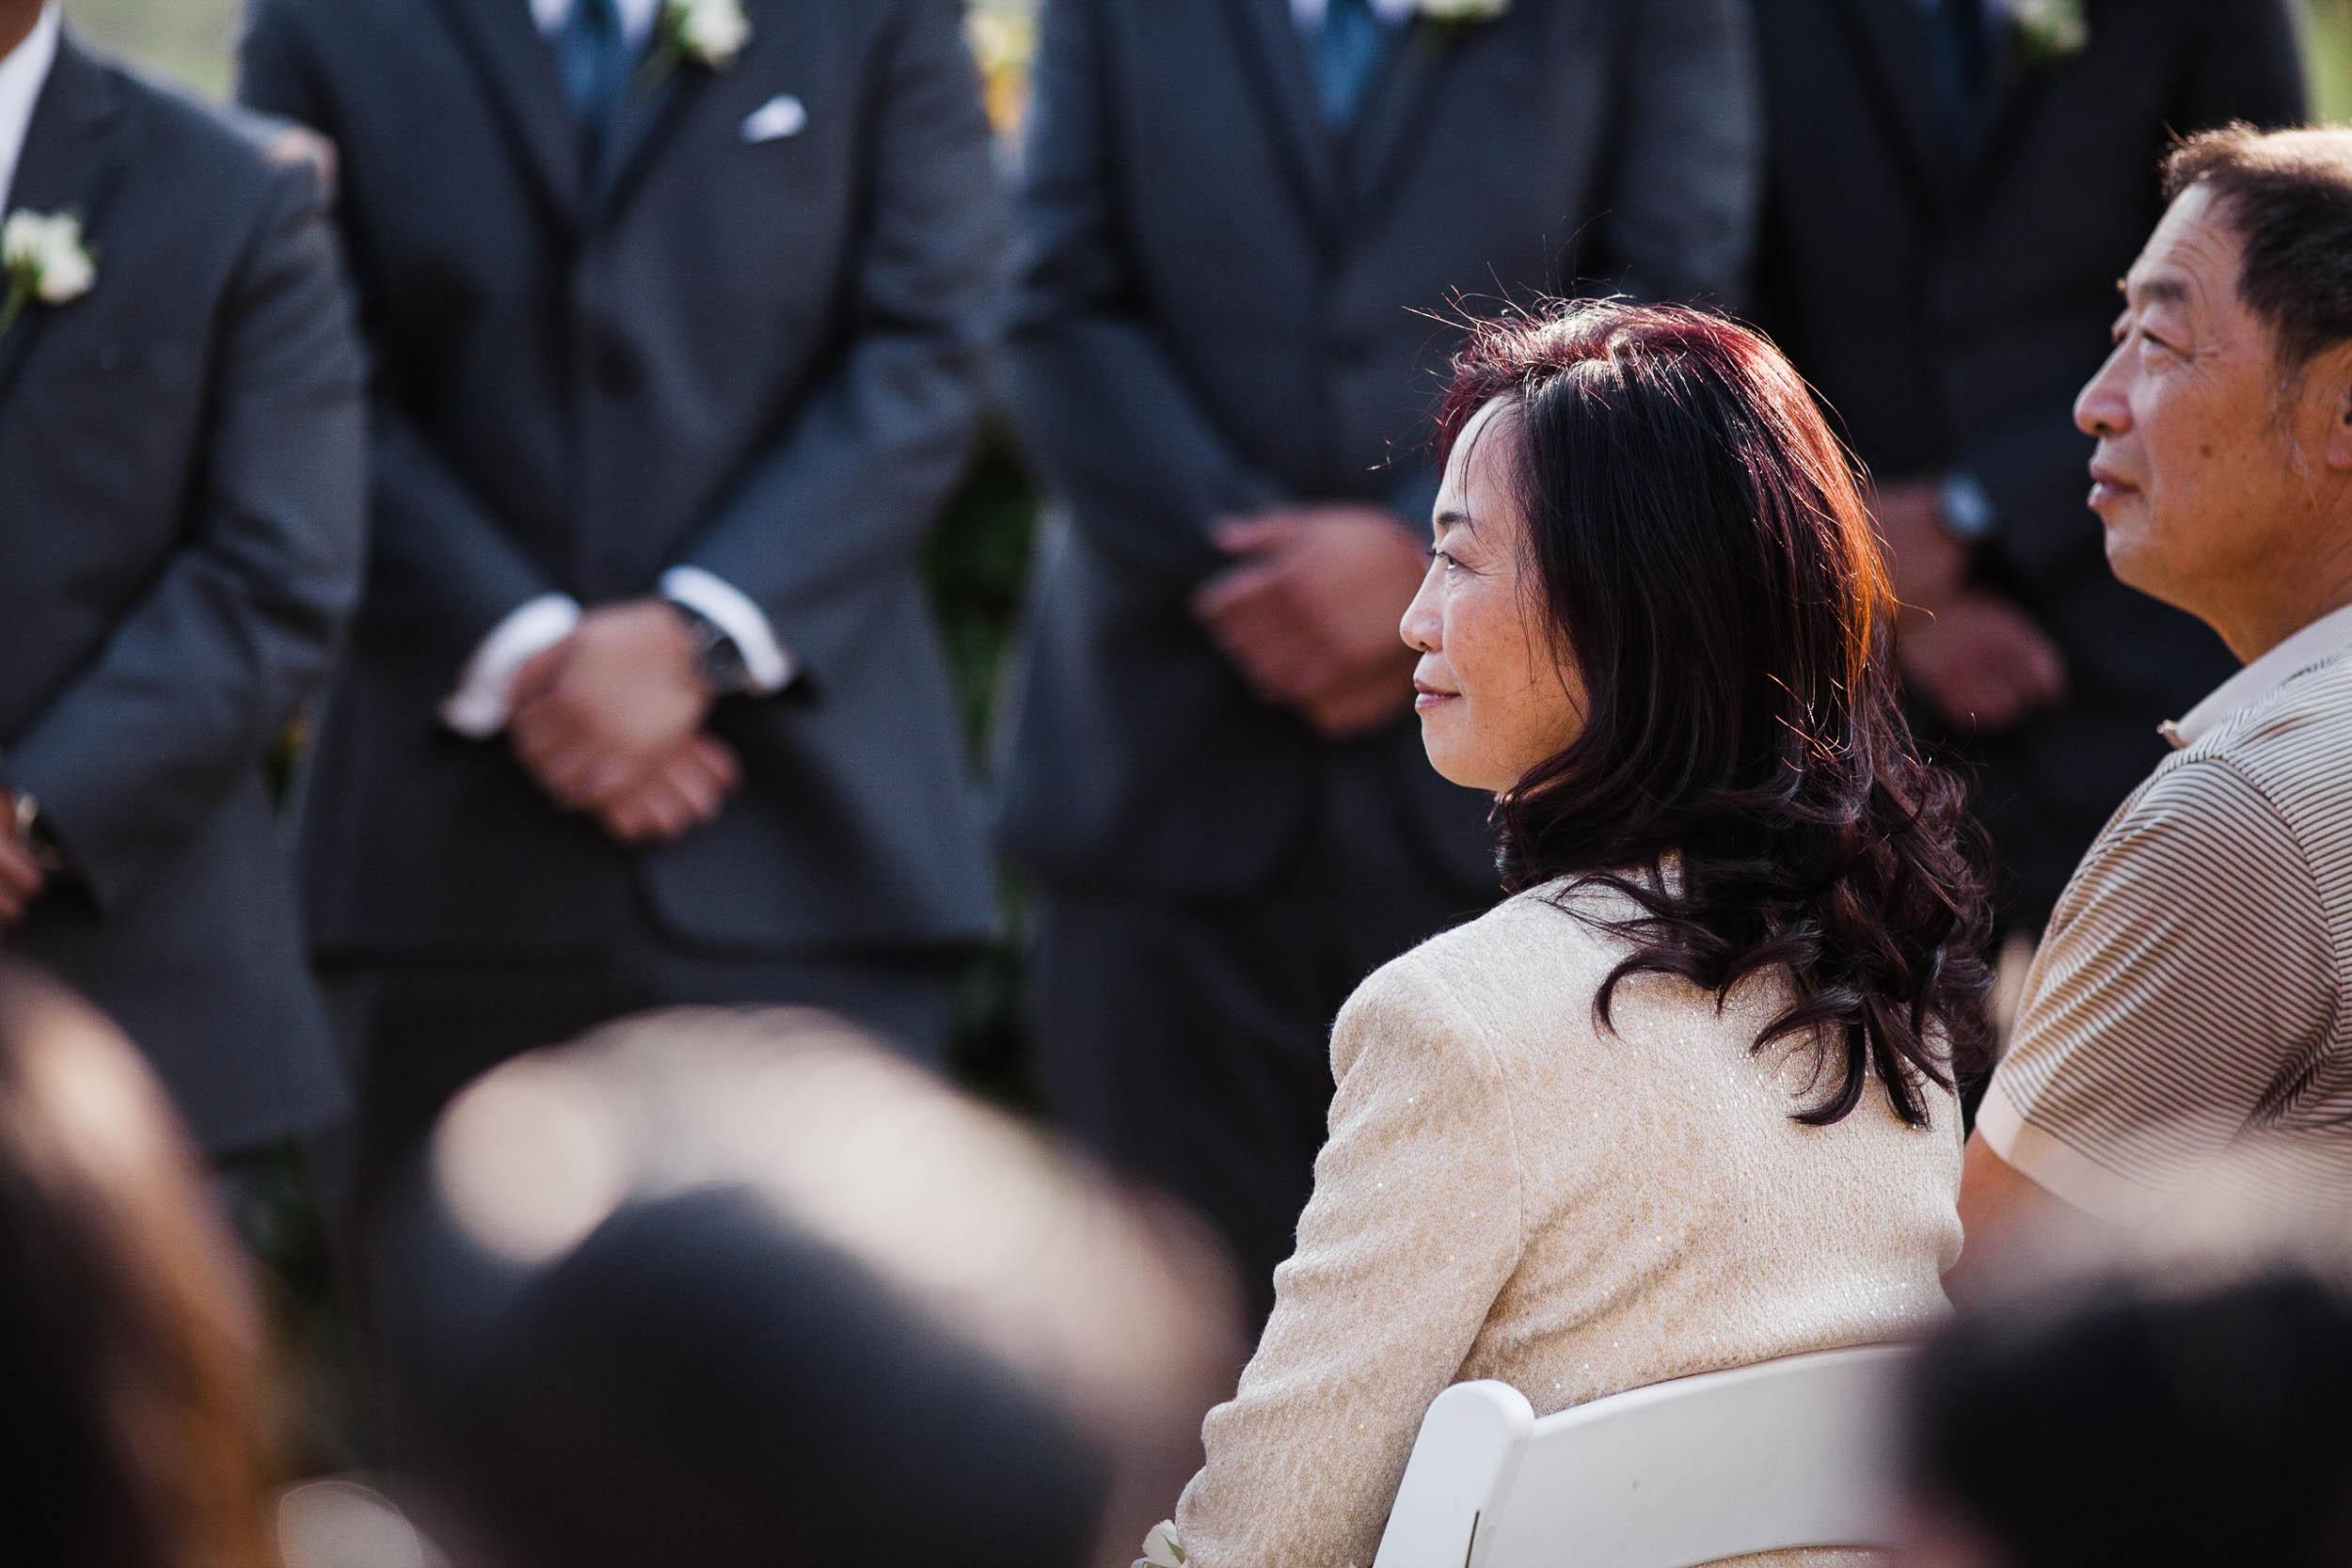 Las Positas Wedding_Buena Lane Photography_090118ER432.jpg